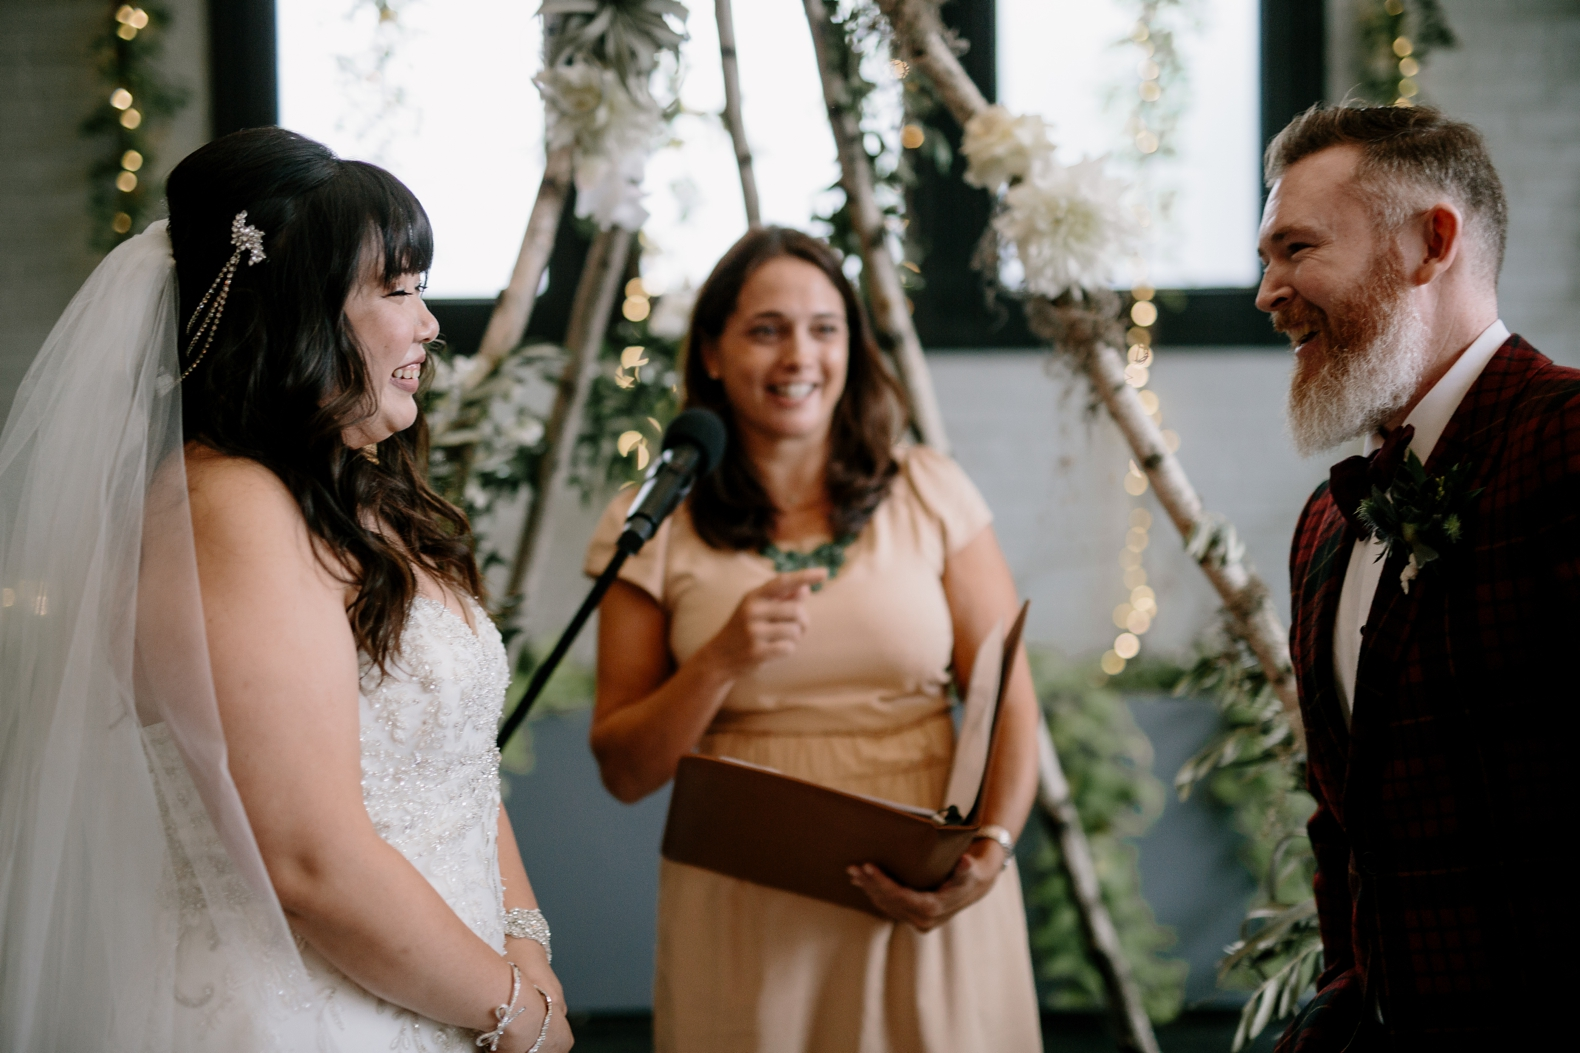 501-union-wedding-0073